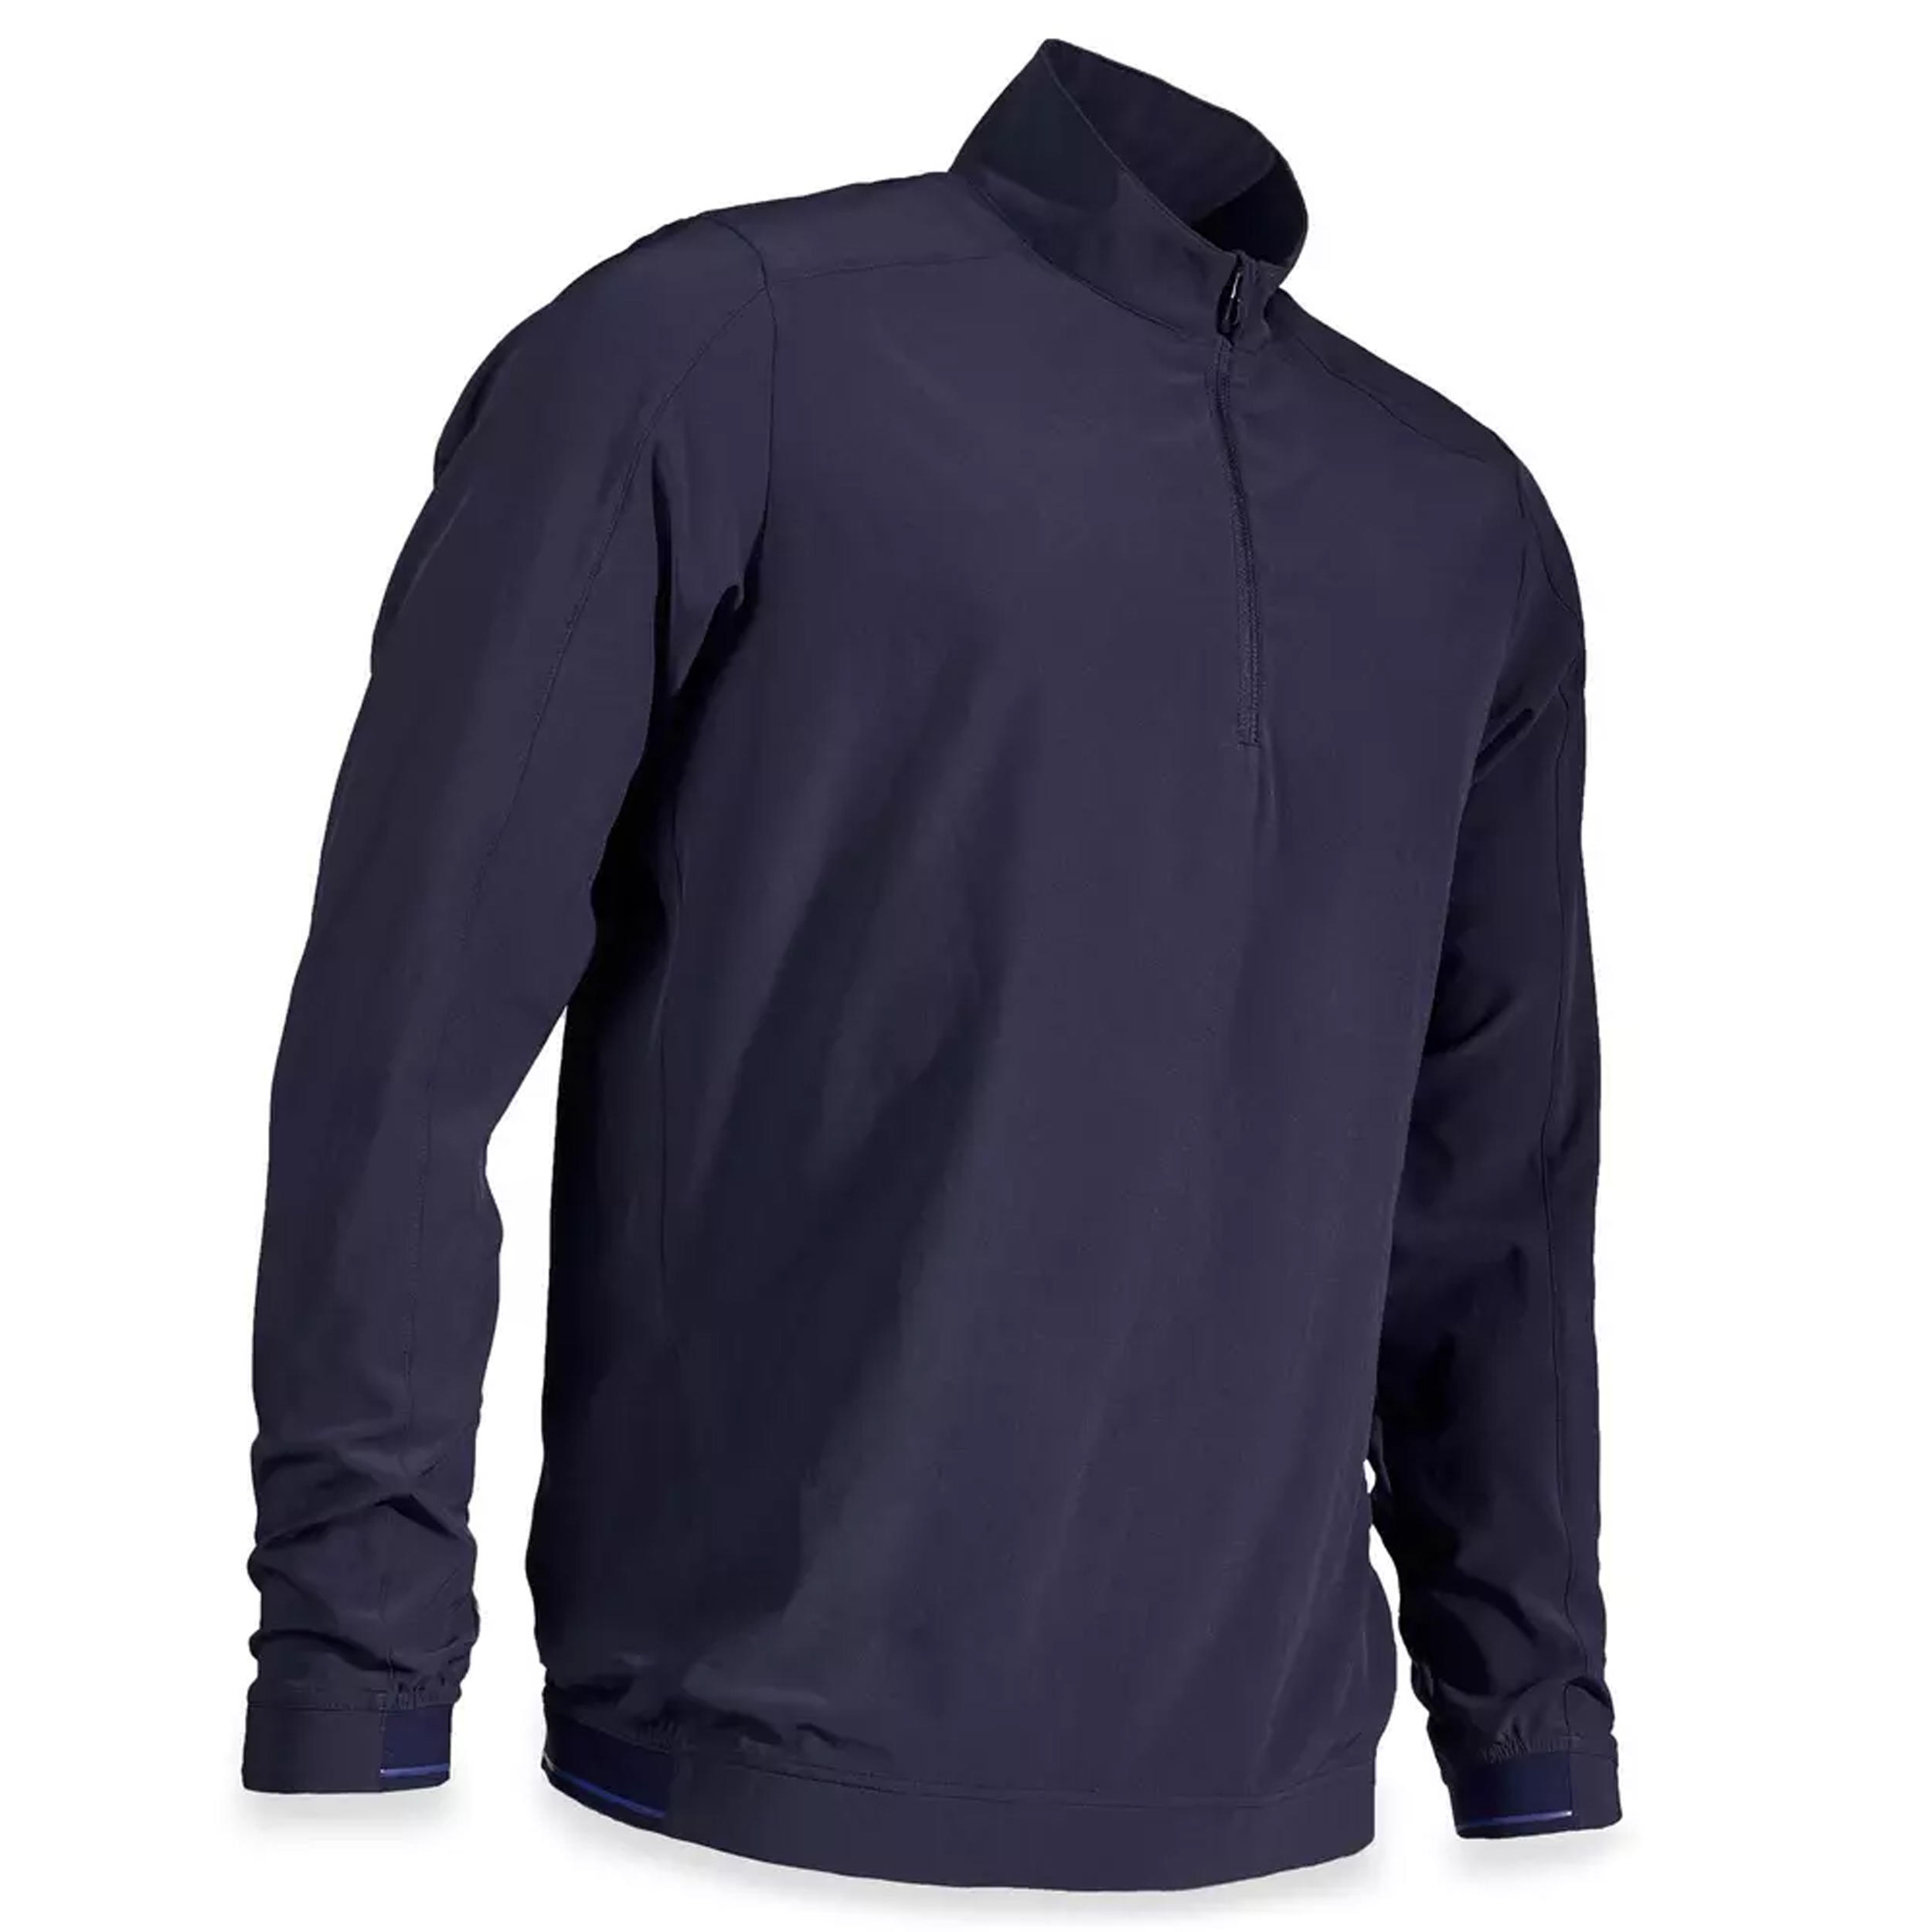 Jachetă Hidrofobă Golf Bărbați la Reducere poza